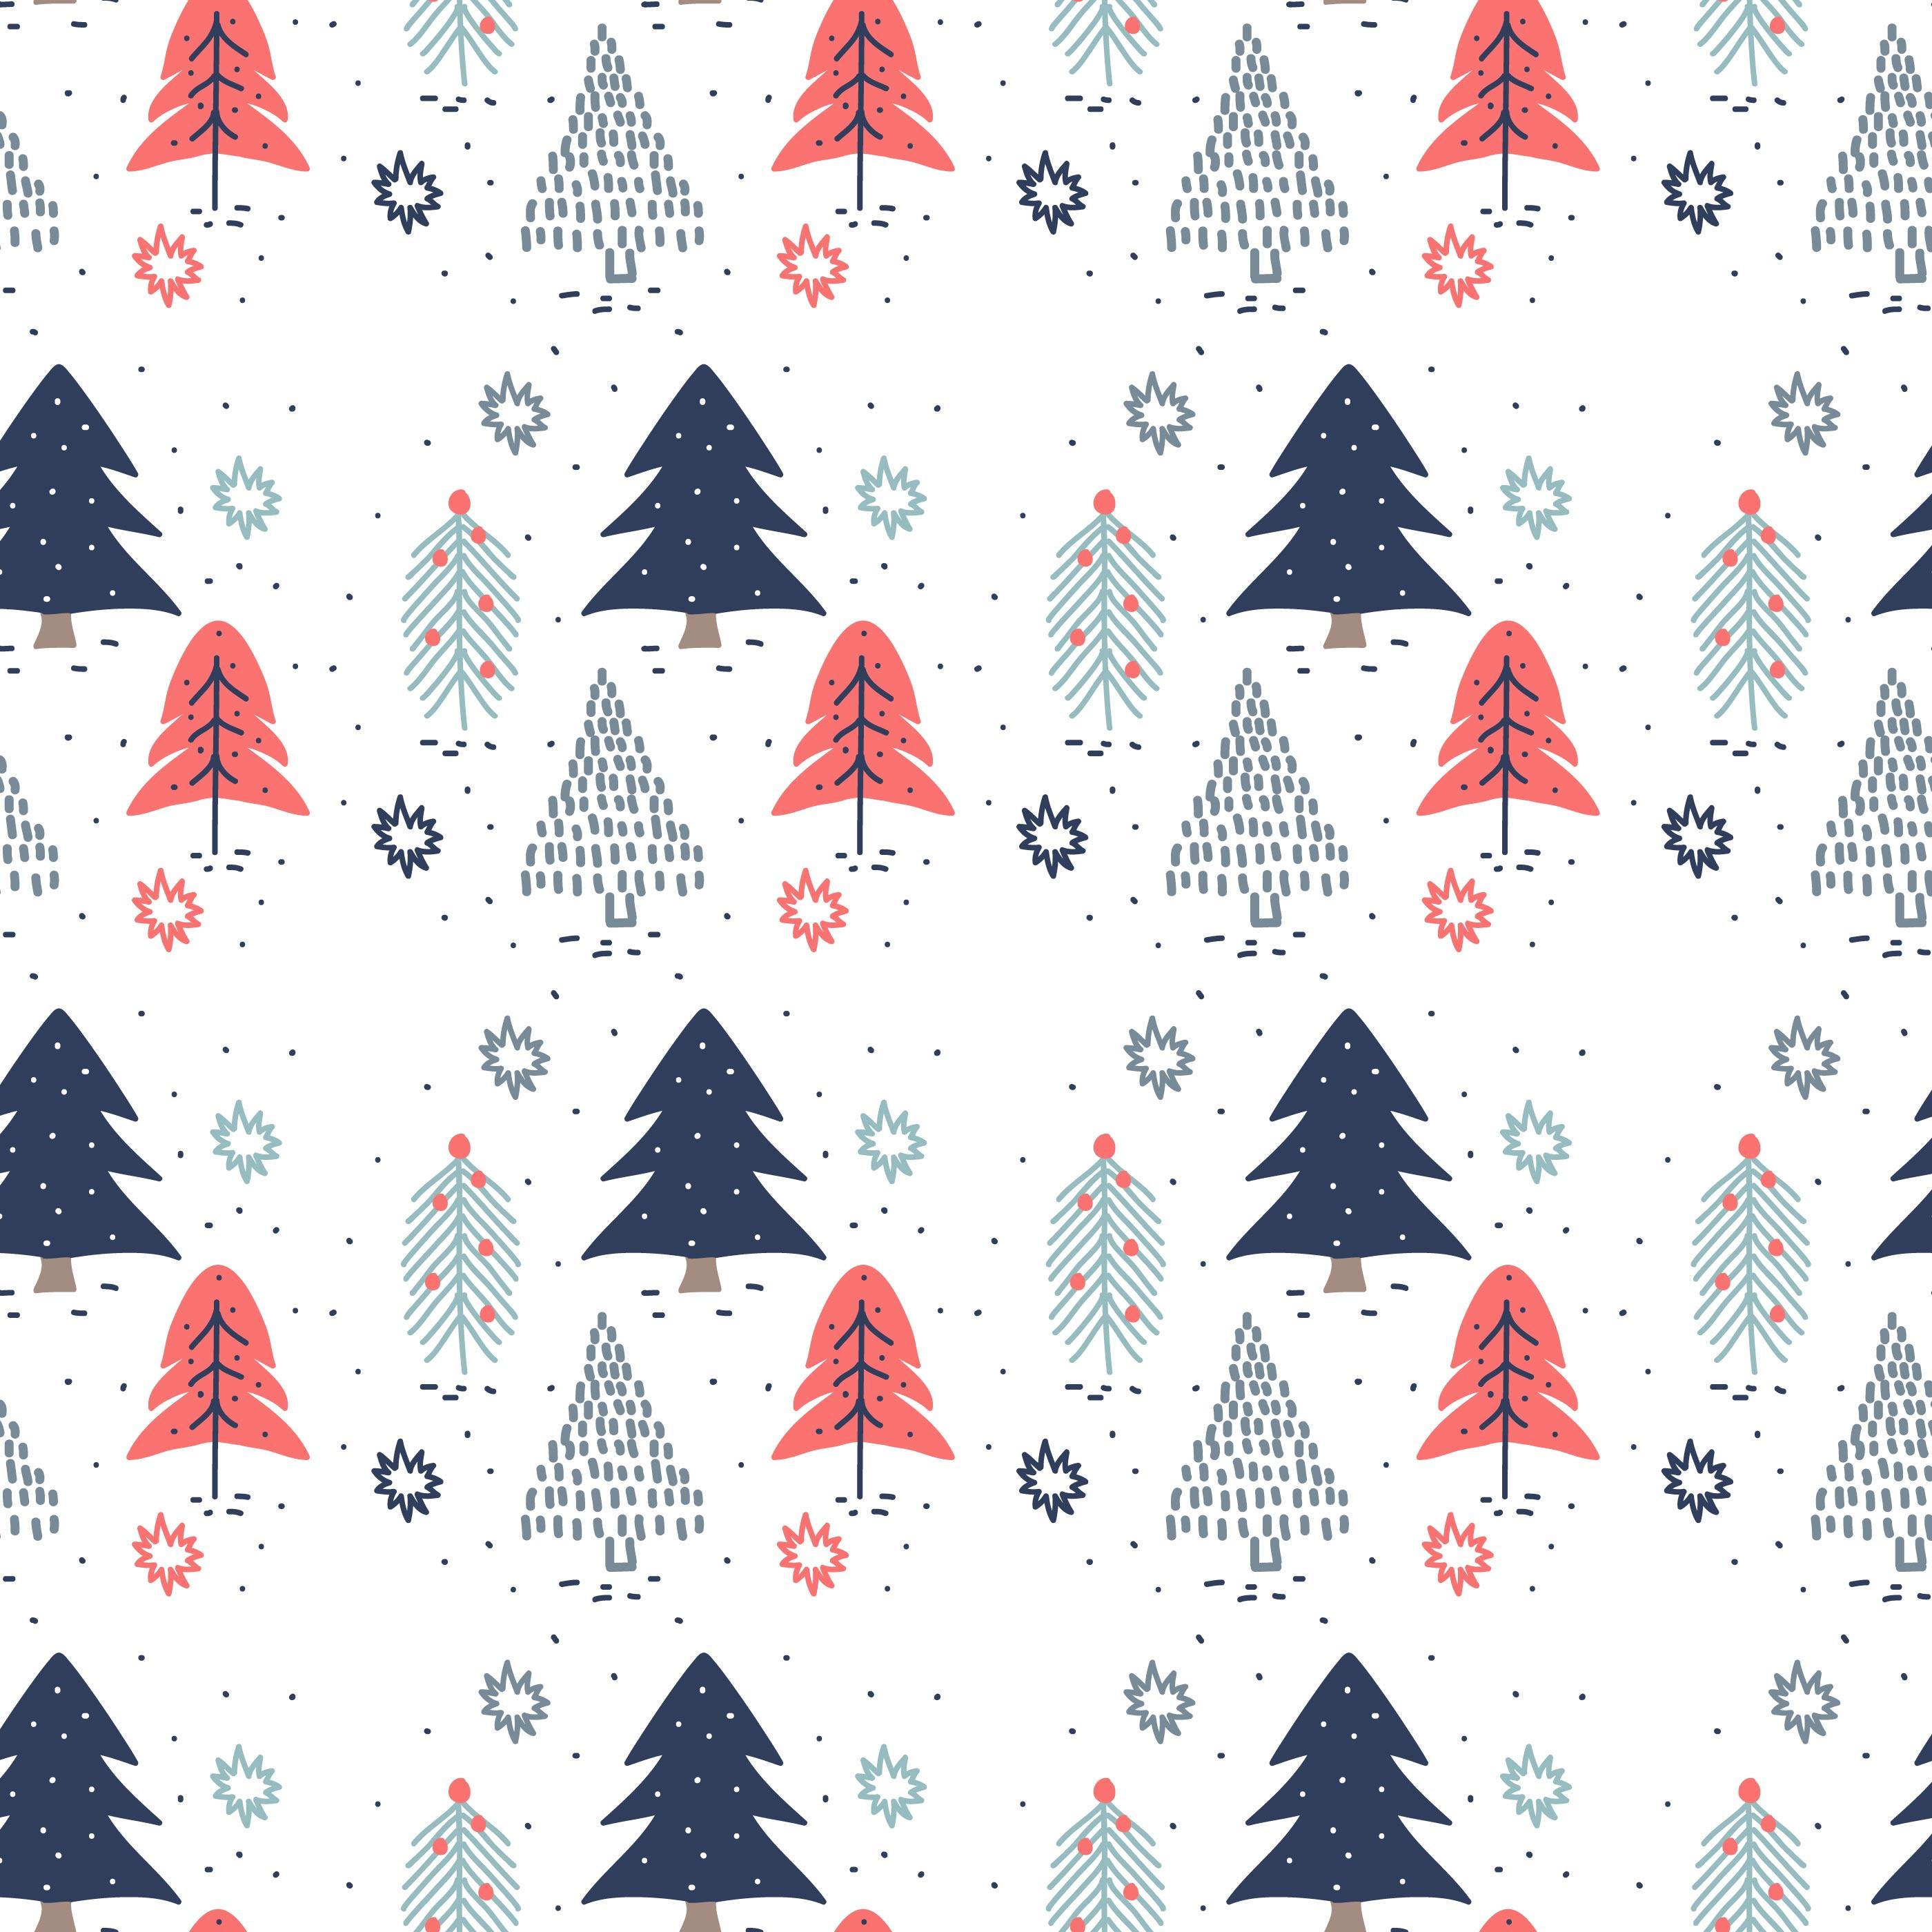 Hand Drawn Christmas Trees Pattern 170954 Vector Art at ...